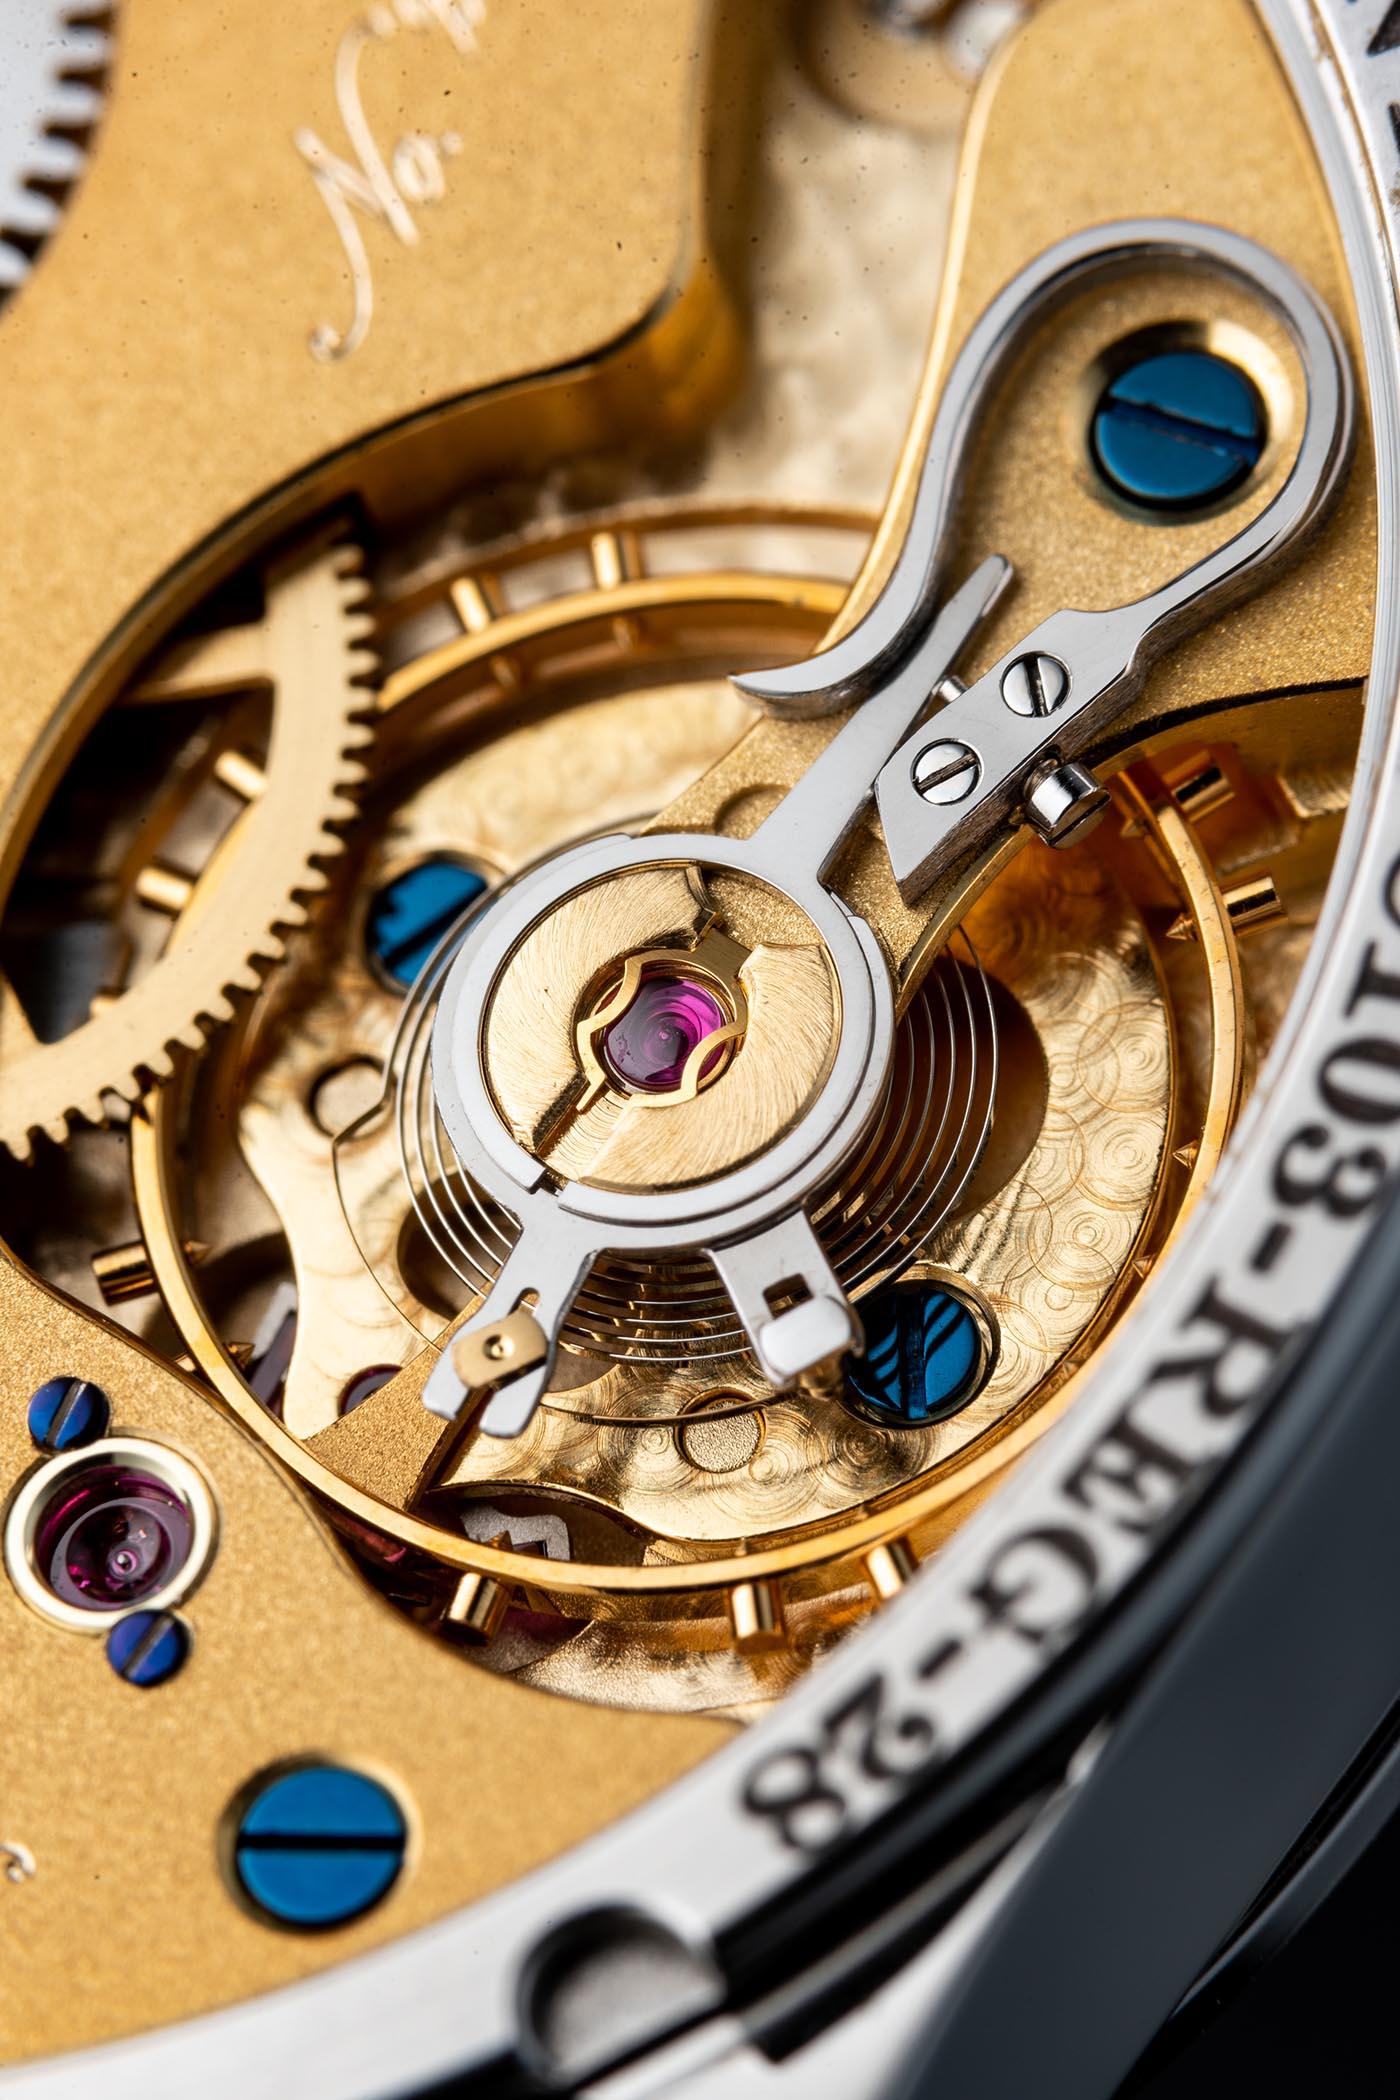 Independent Watchmaking - Cornehl Watches - 2